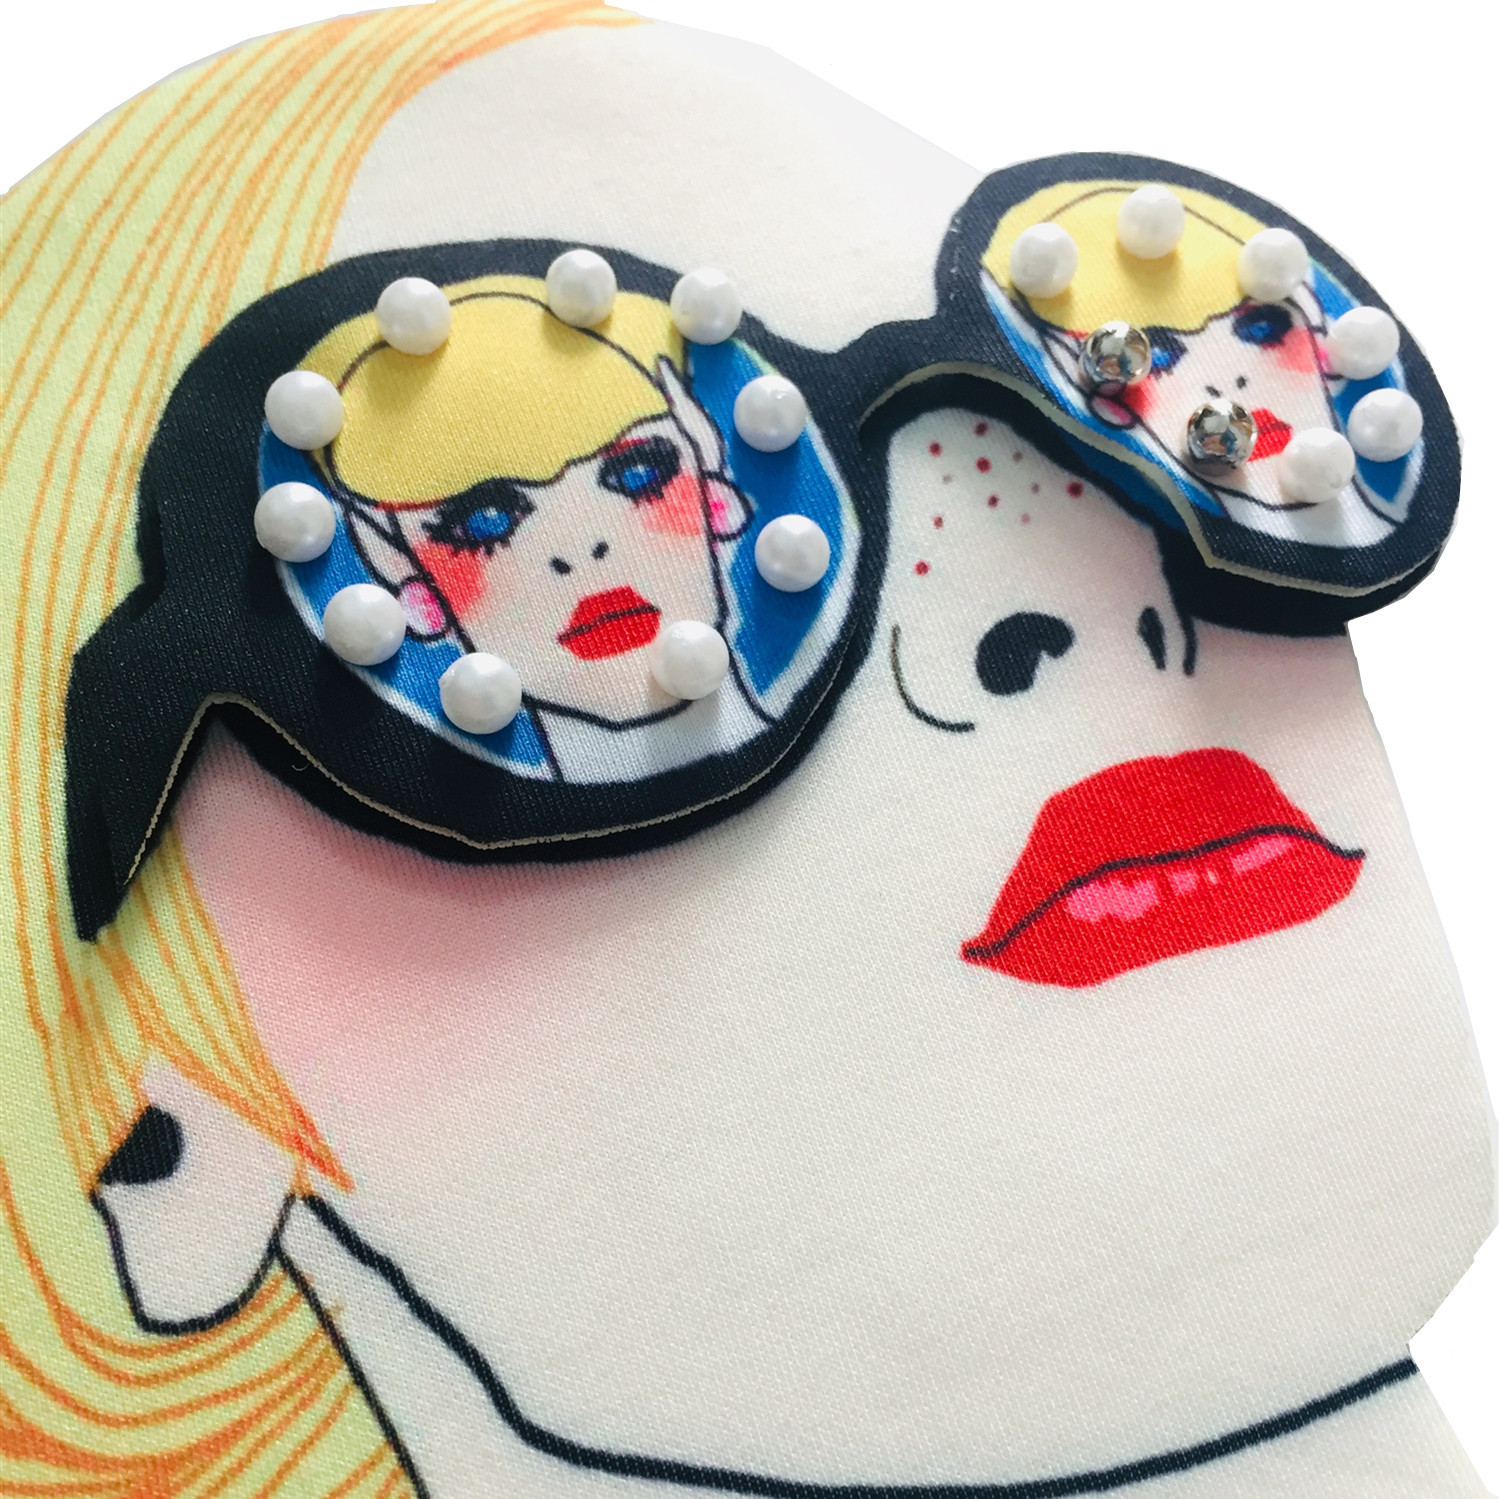 Gafas de impresión chica estampado en caliente pegatinas de tela impresas transferencia de calor 3D accesorios de decoración de ropa NHLT184885